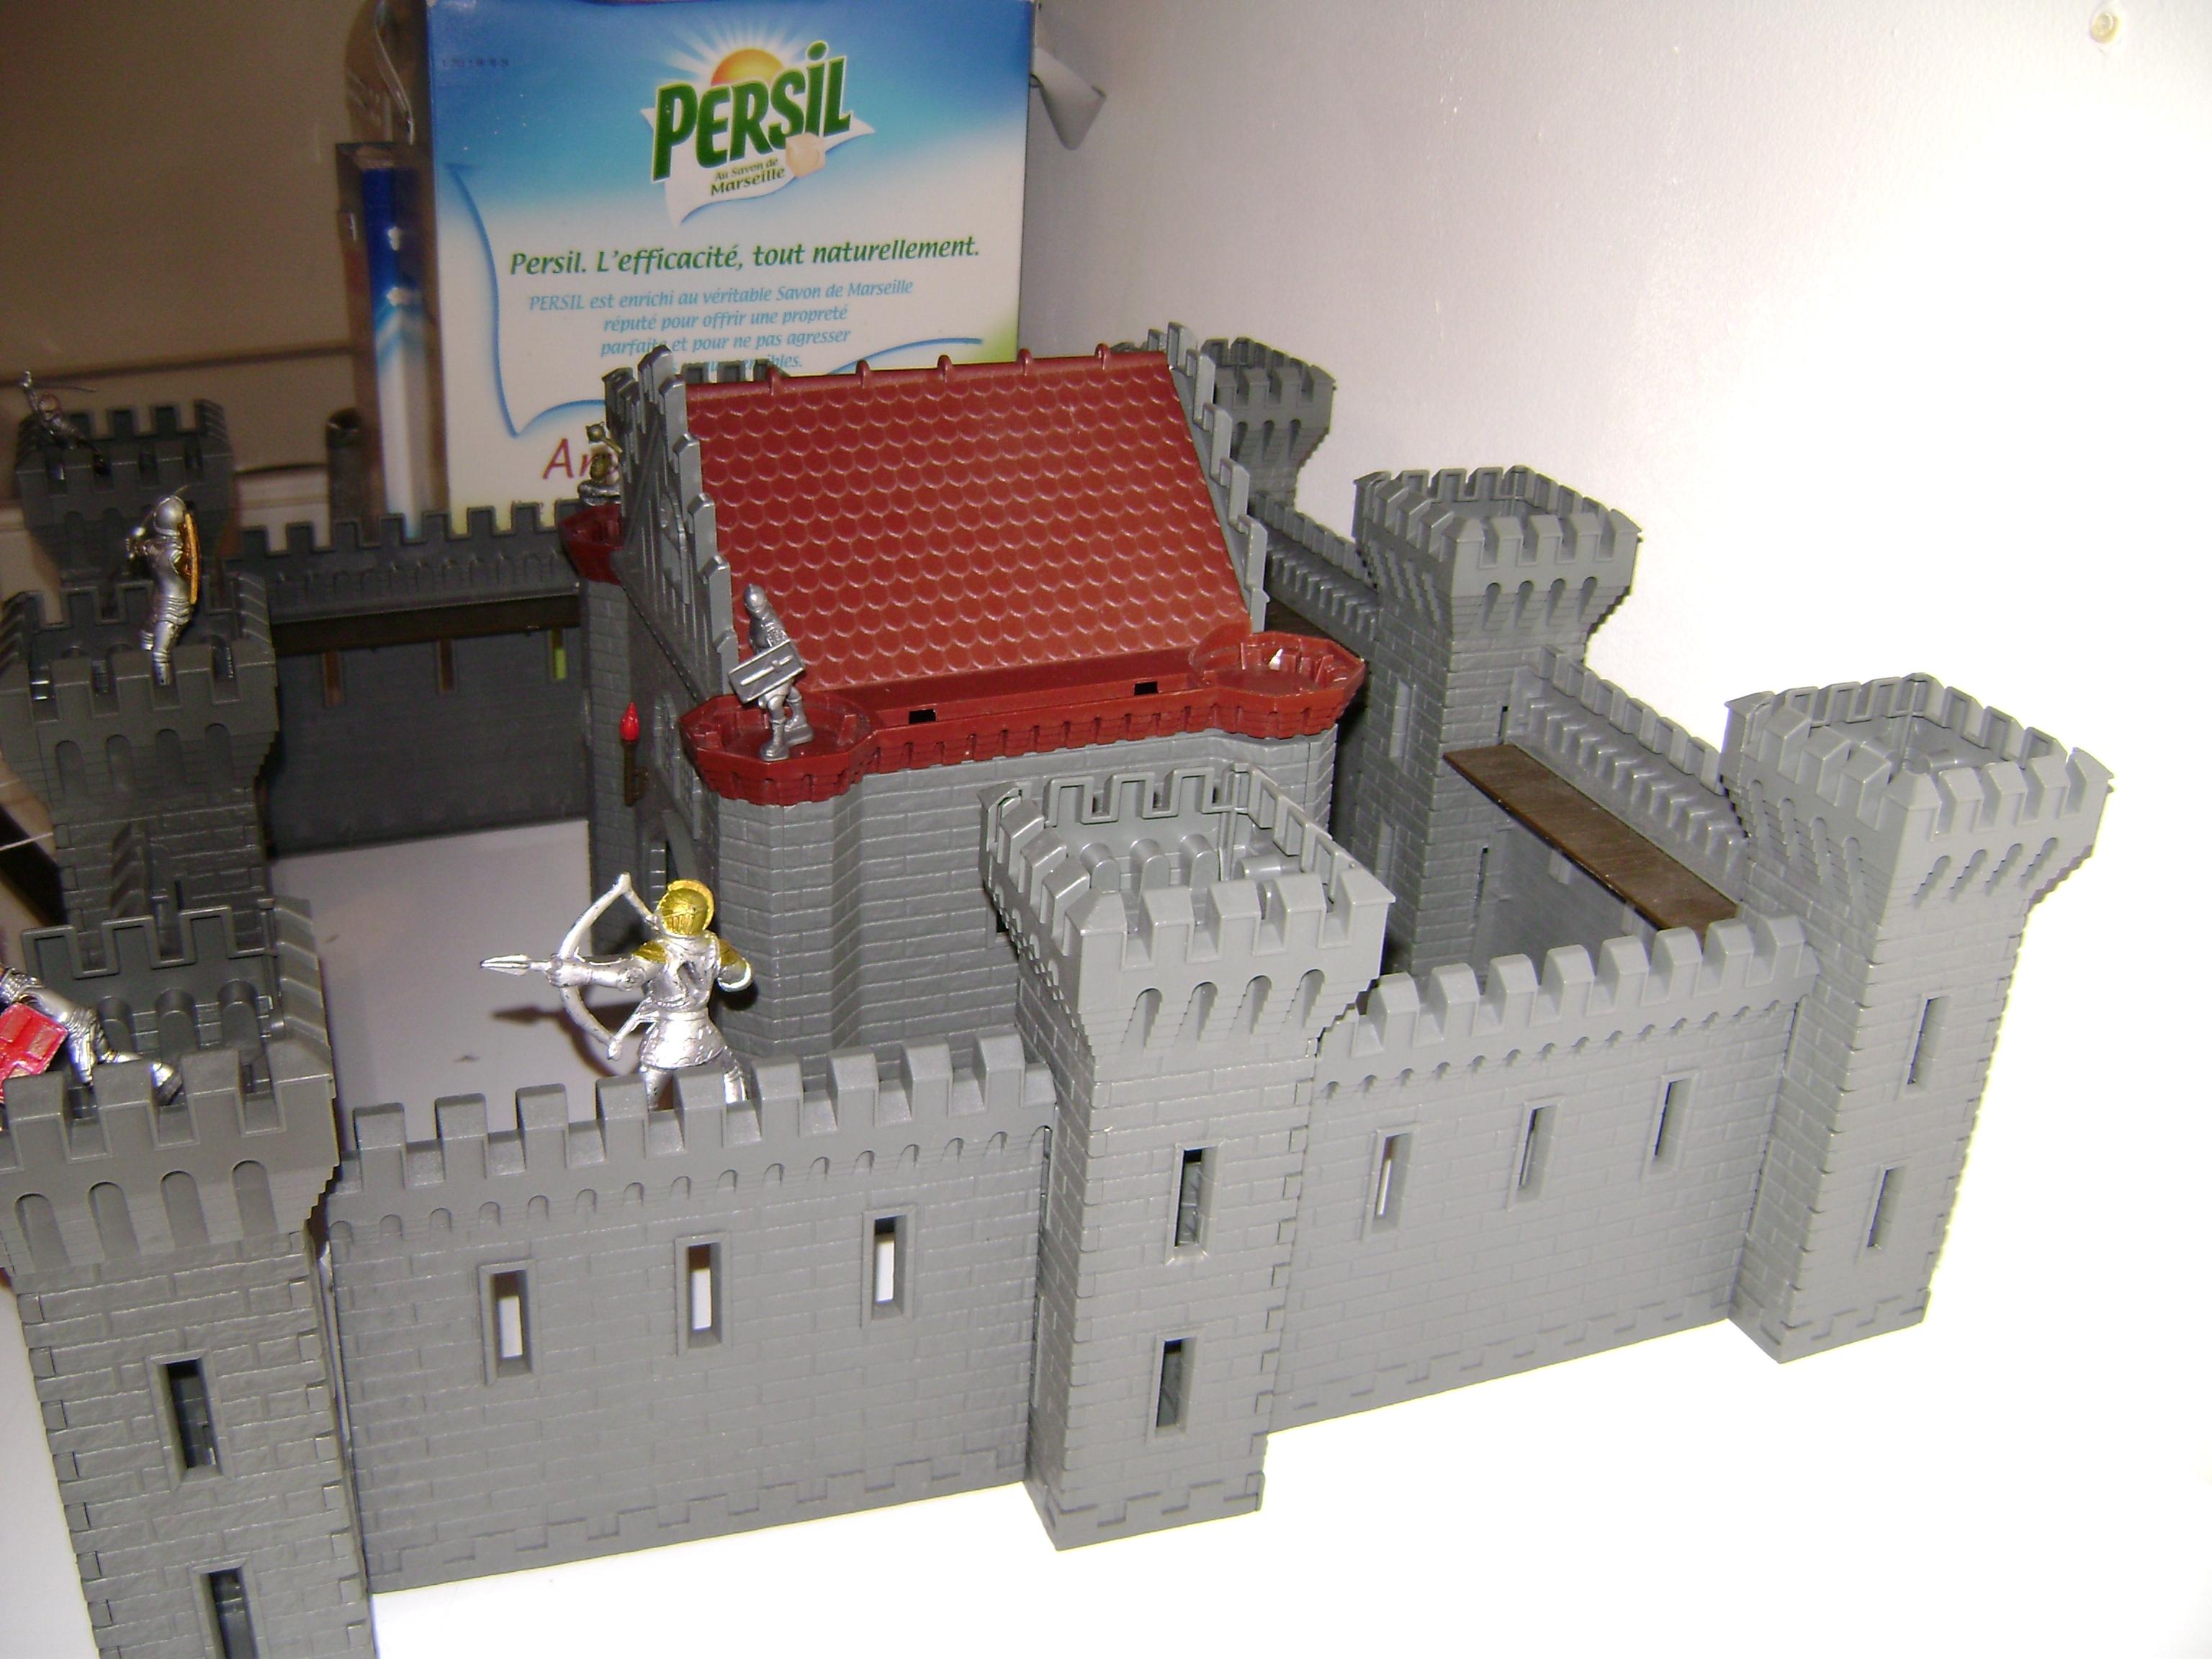 chateau fort jouets et peluches bibilou6 photos club doctissimo. Black Bedroom Furniture Sets. Home Design Ideas